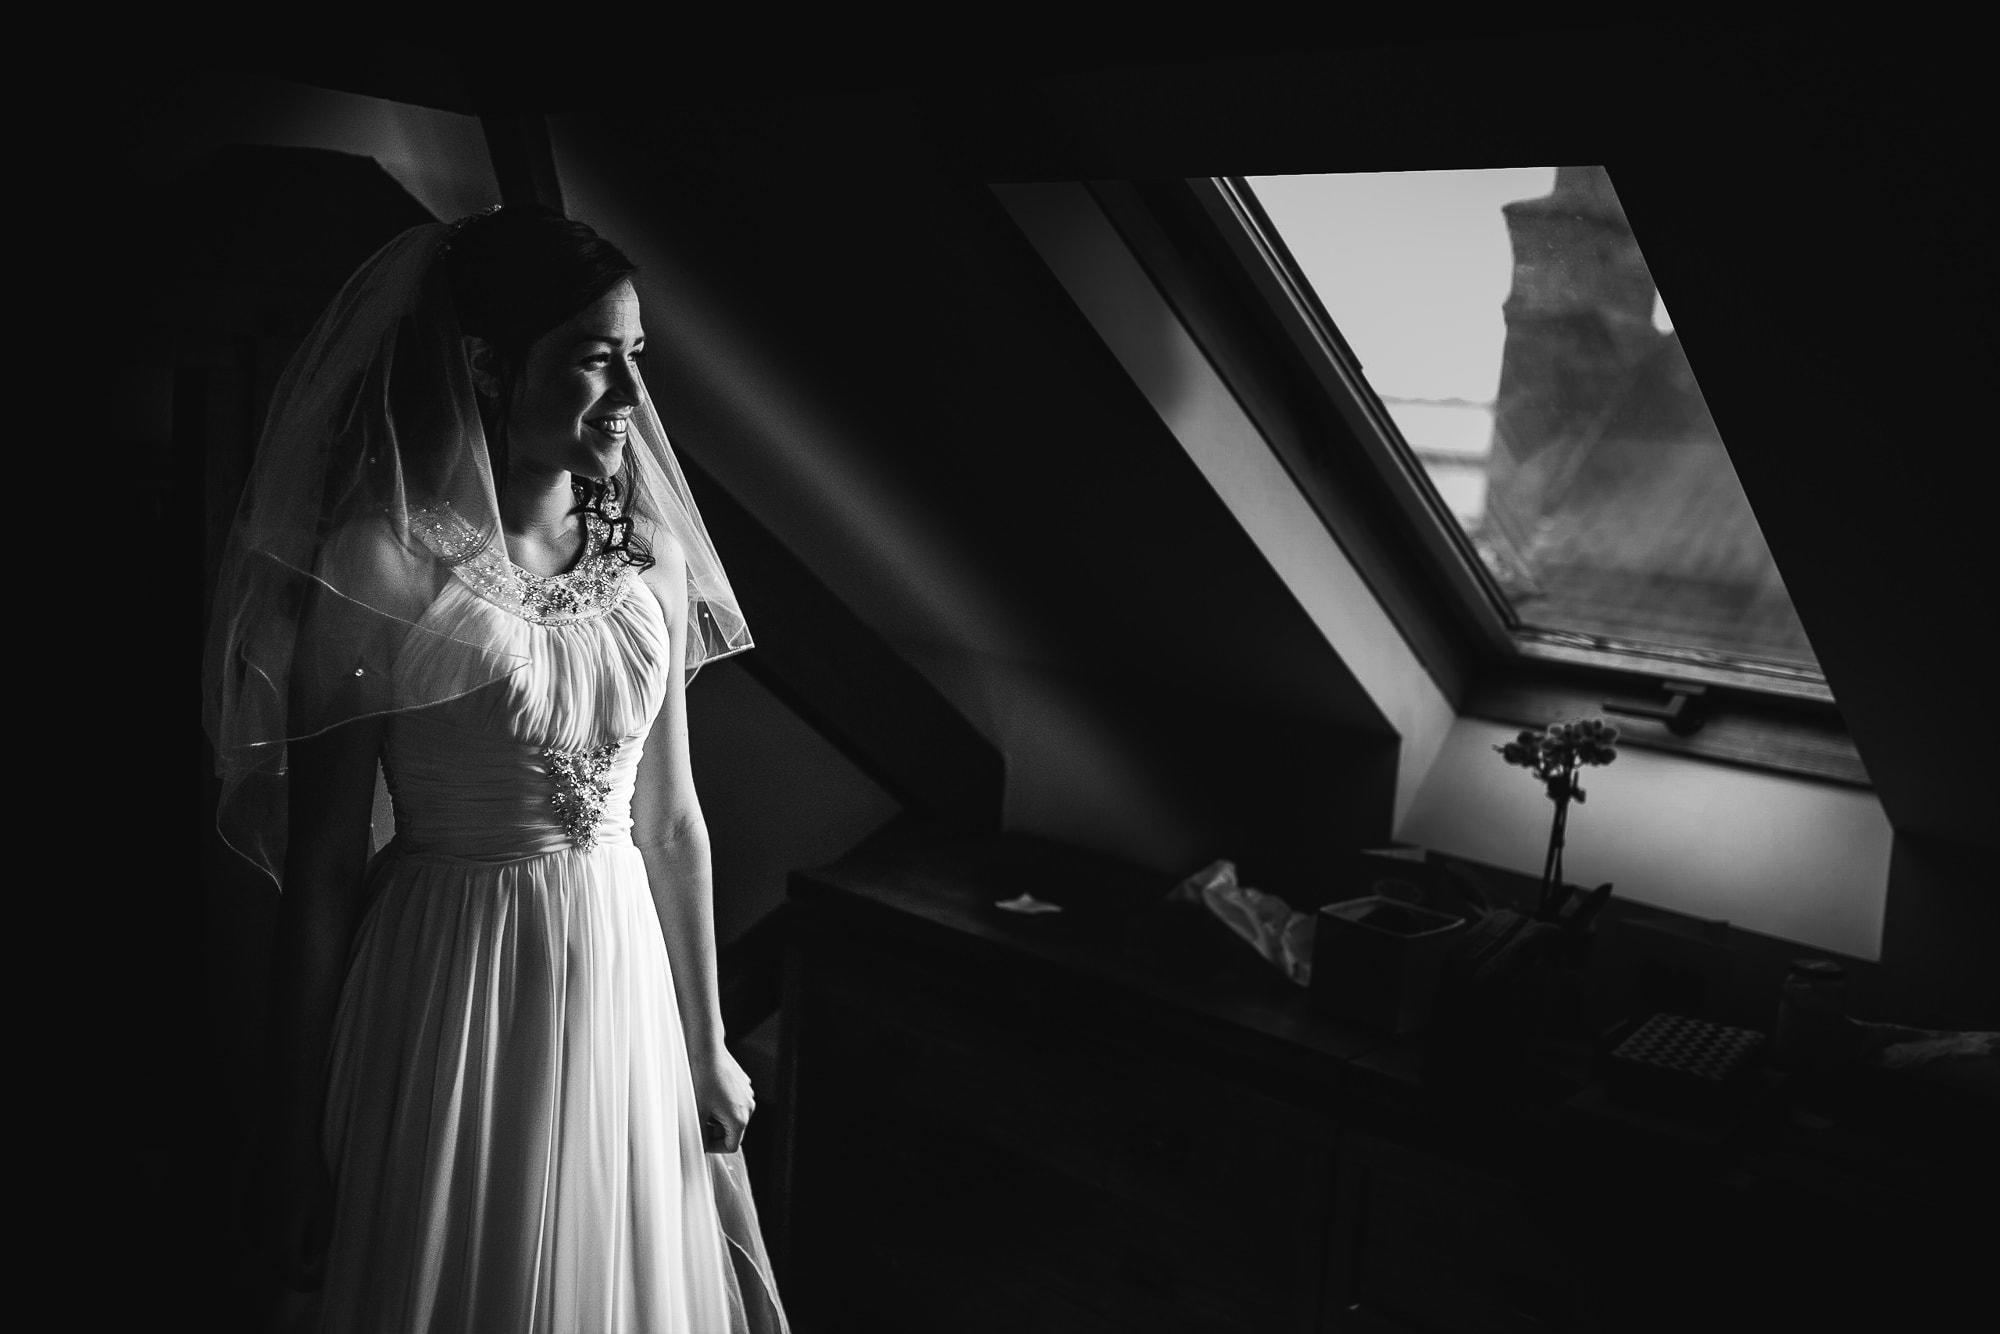 Matlt-Cross-Nottingham-wedding-Photography-17